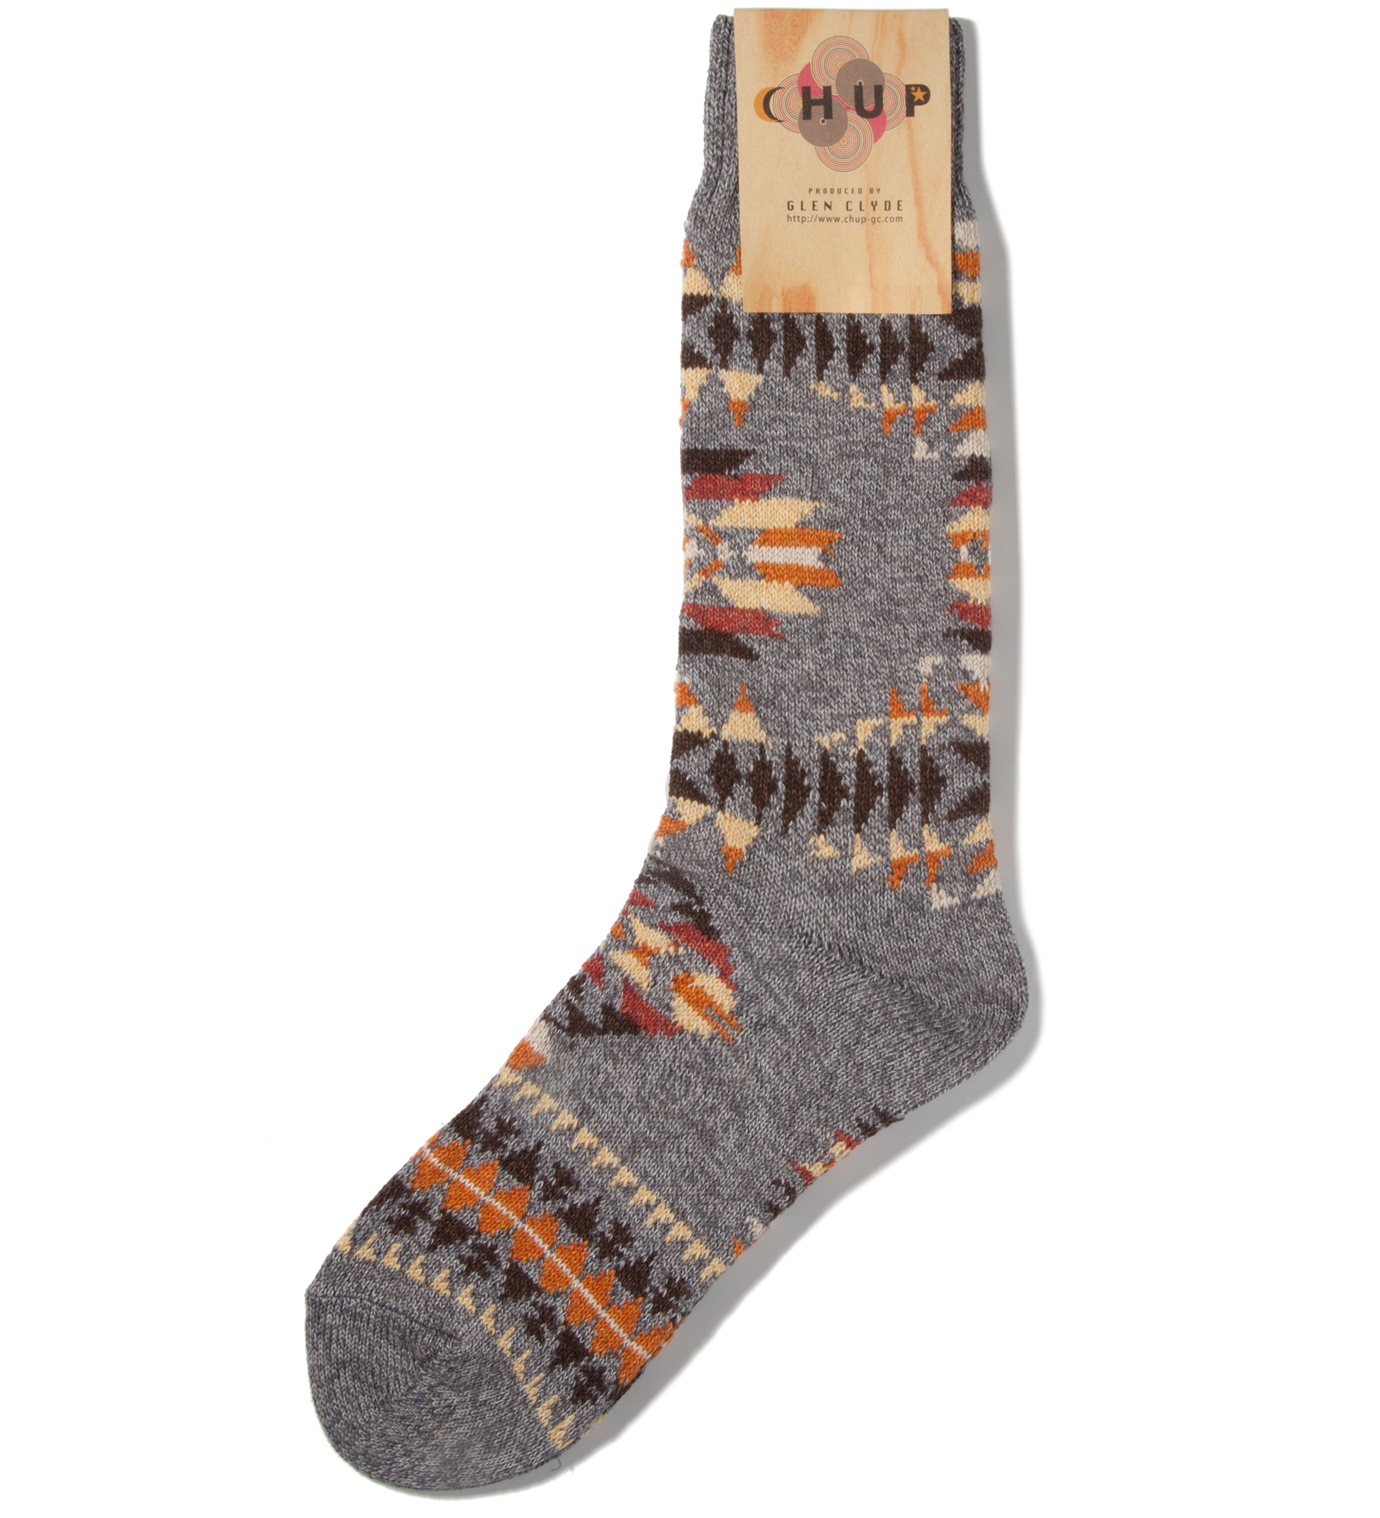 CHUP Grey Serape Socks